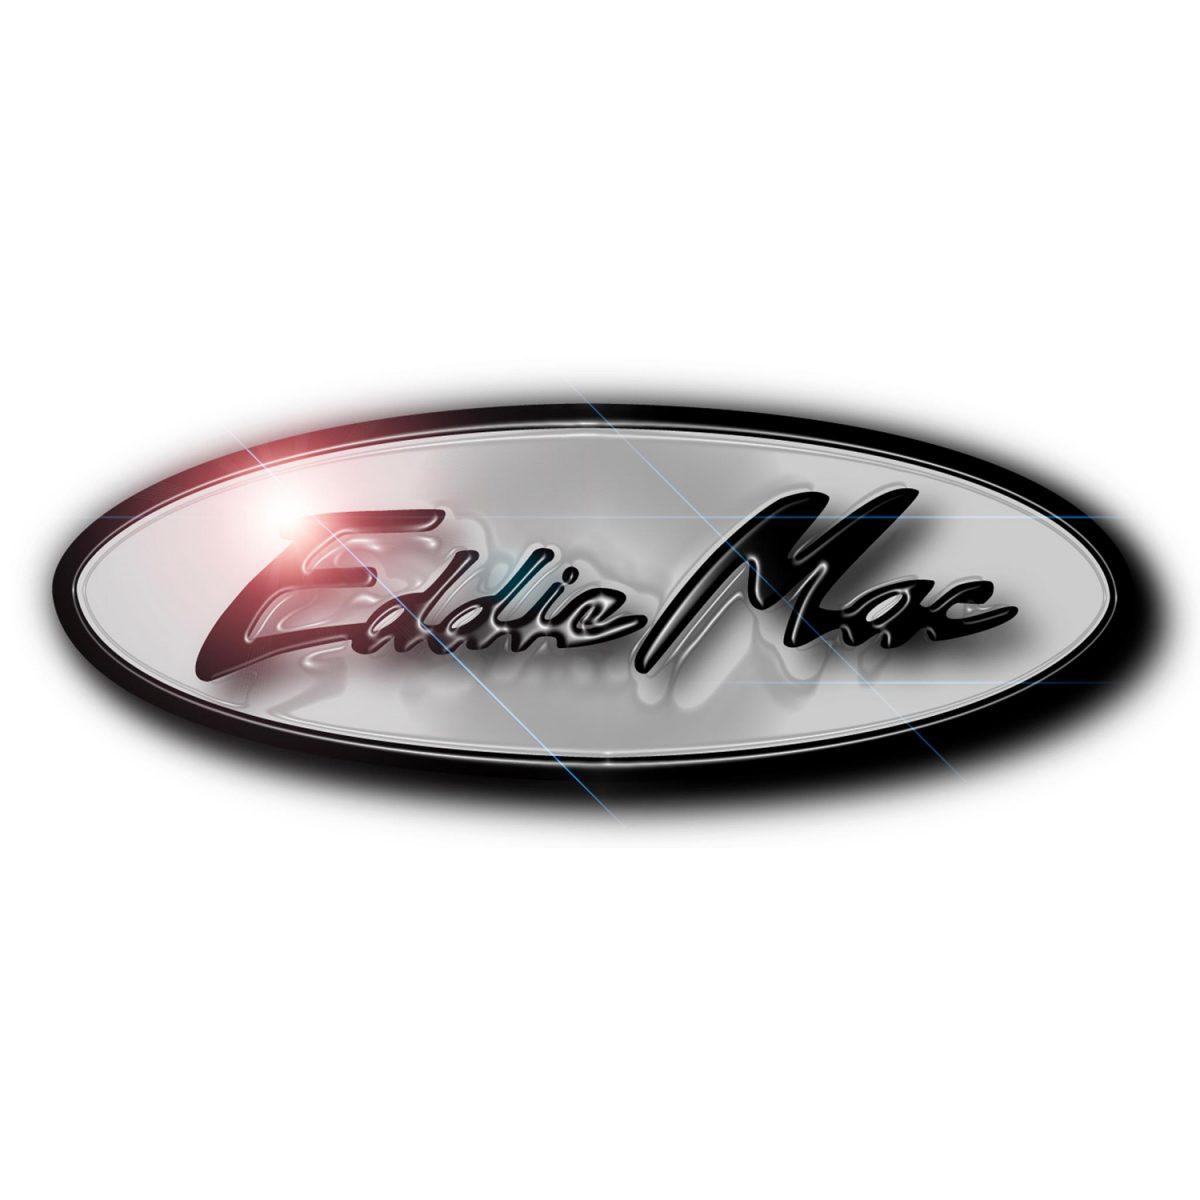 Eddie Mac 25th Anniversary Concert